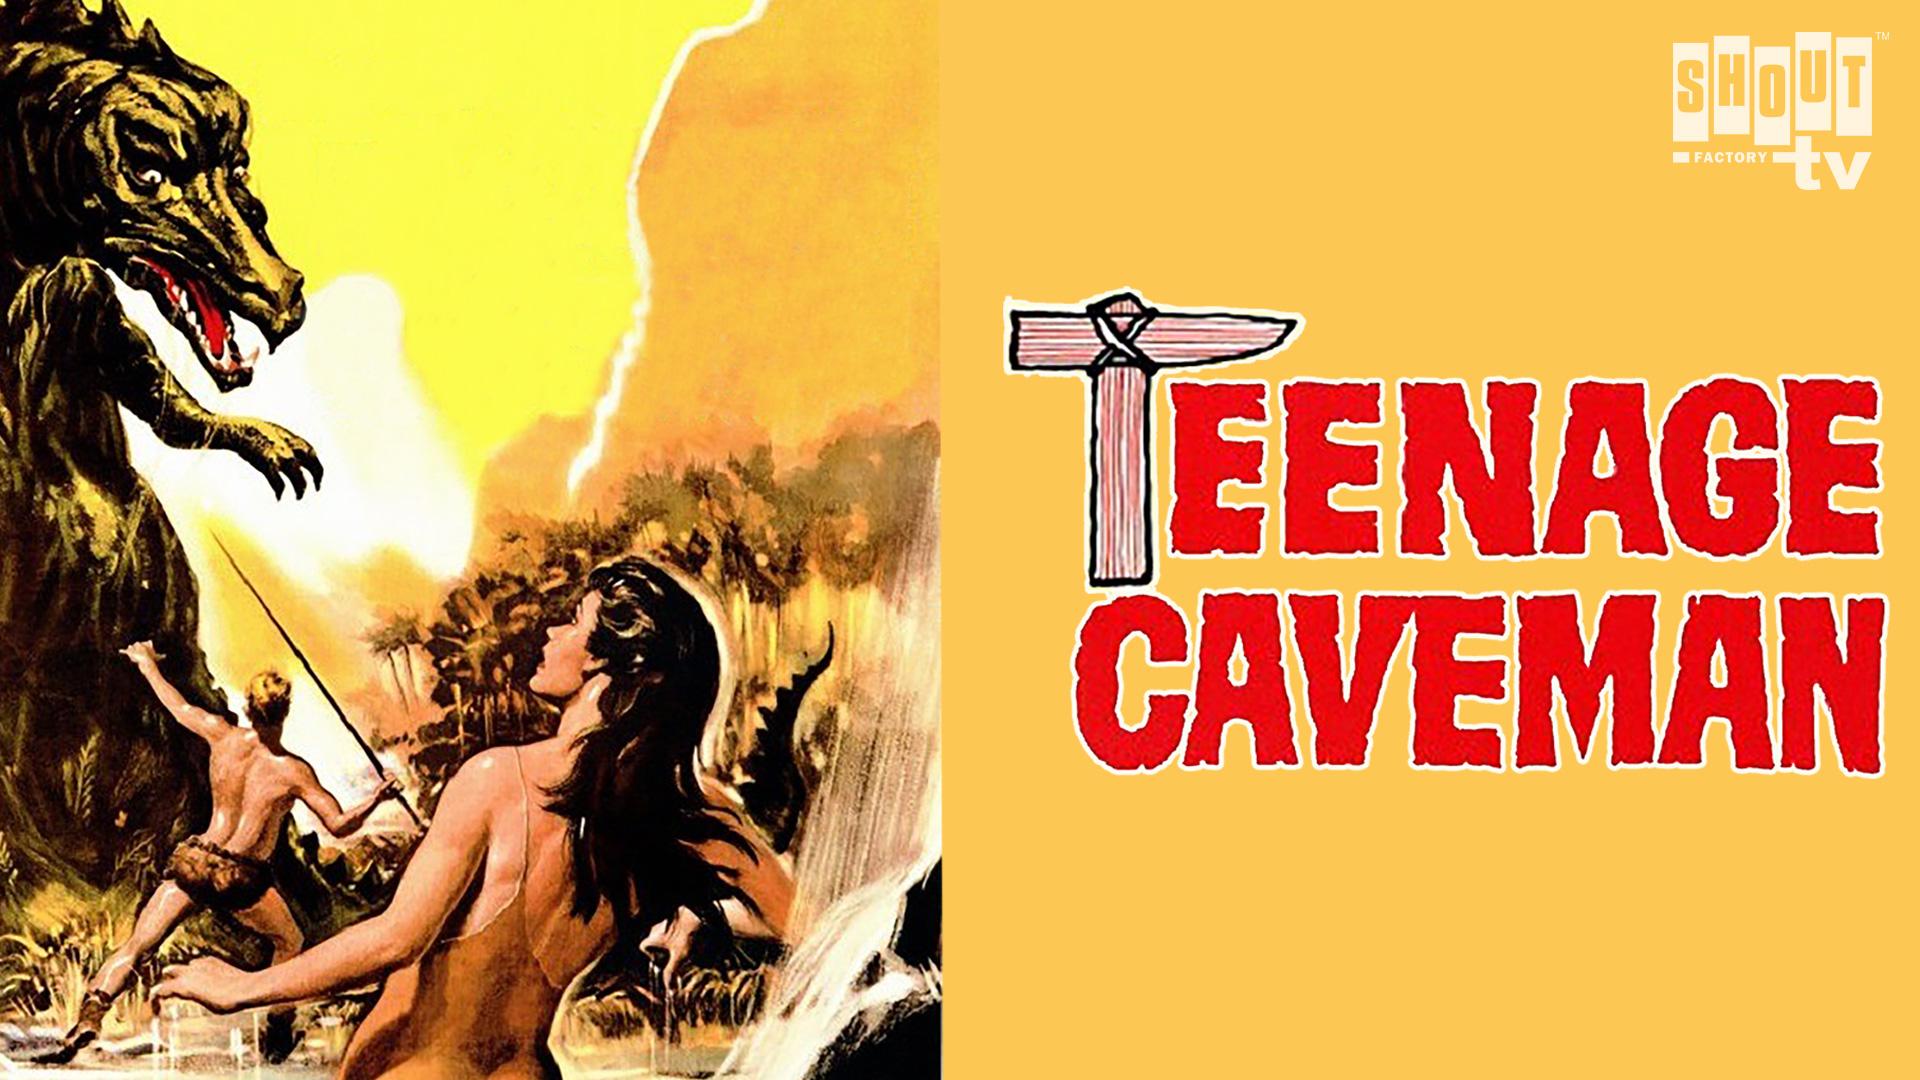 Teenage Caveman - Trailer